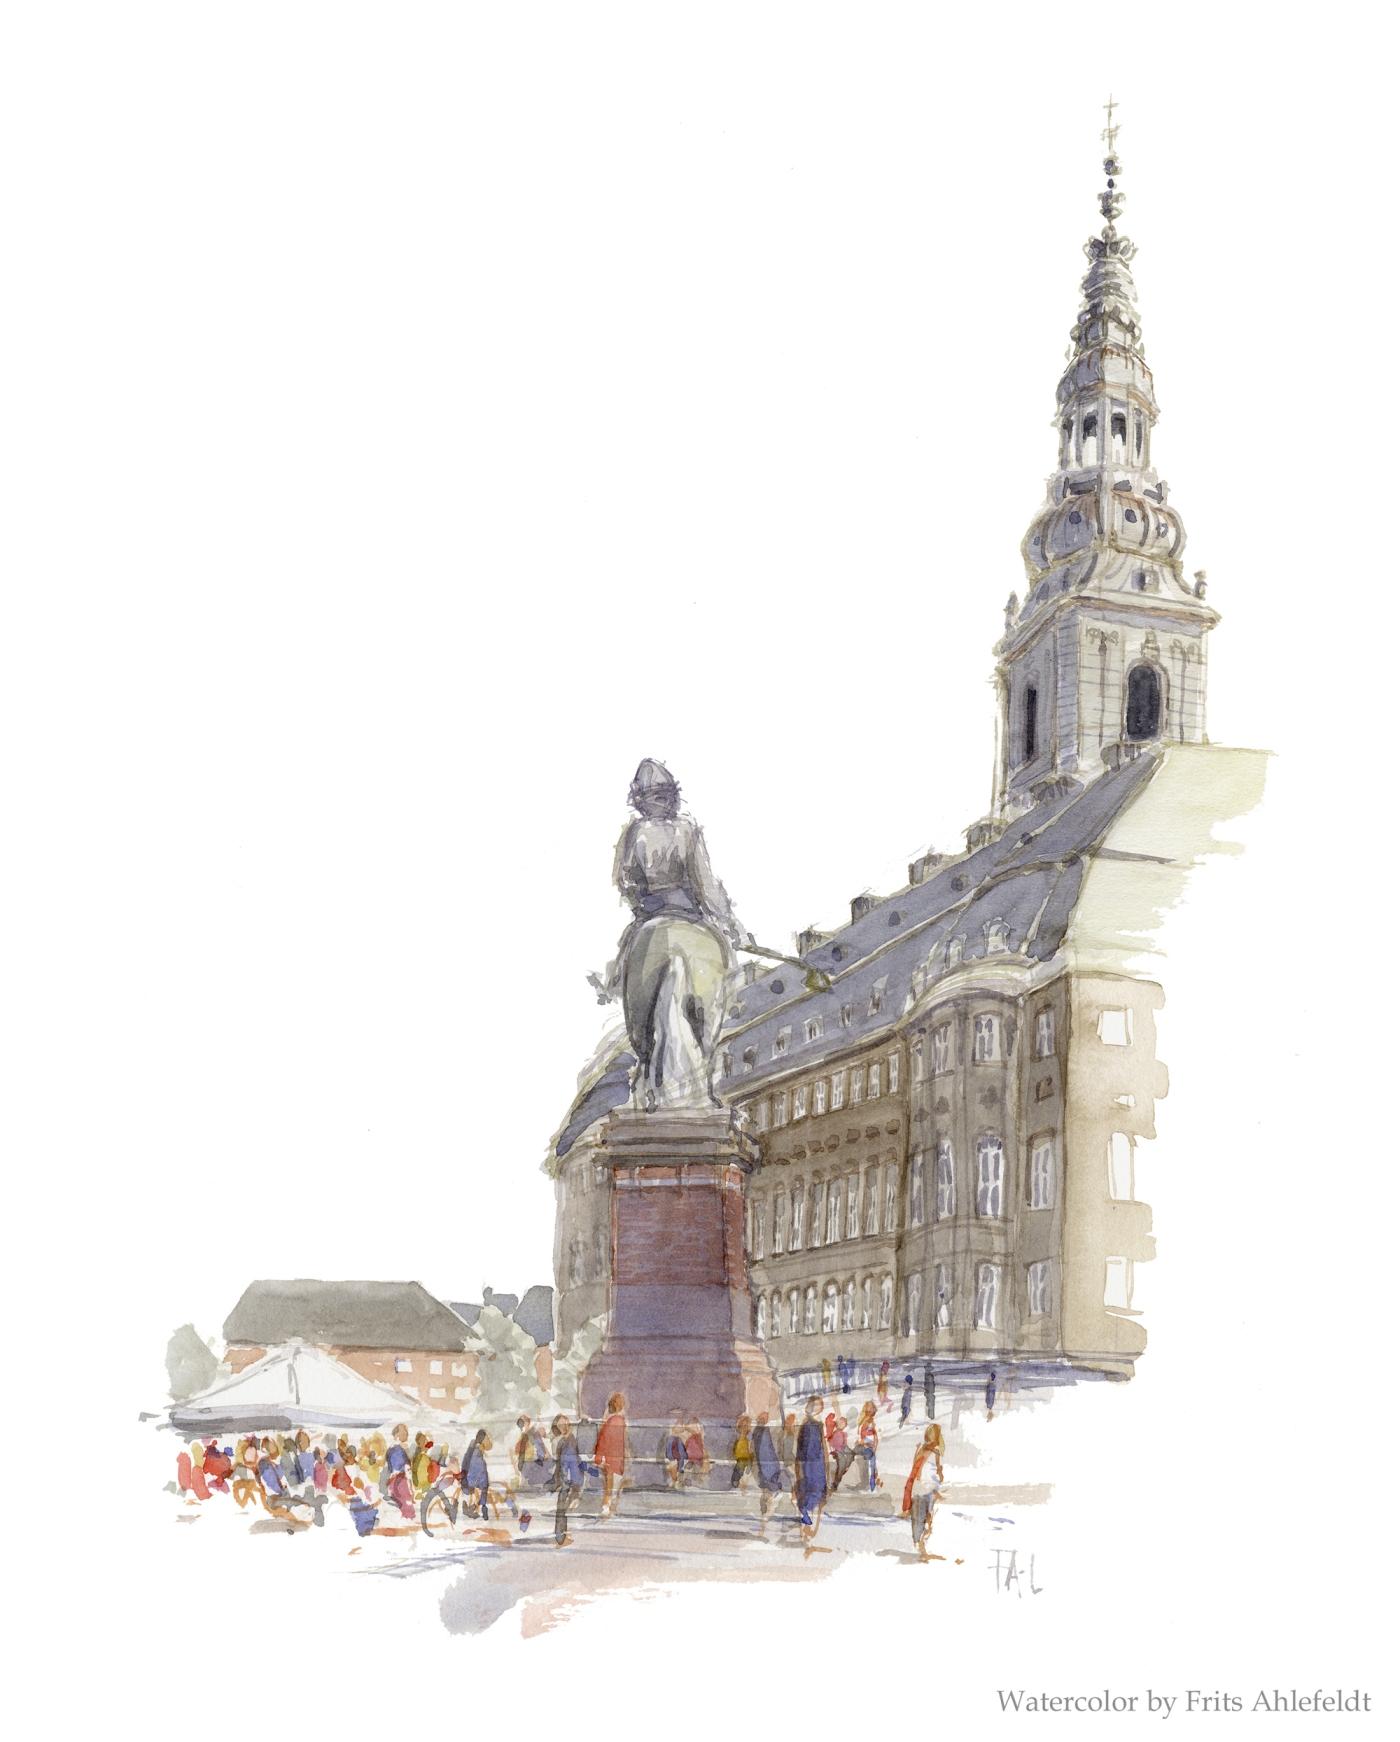 Danish Parliament Christiansborg Copenhagen Watercolor by Frits Ahlefeldt